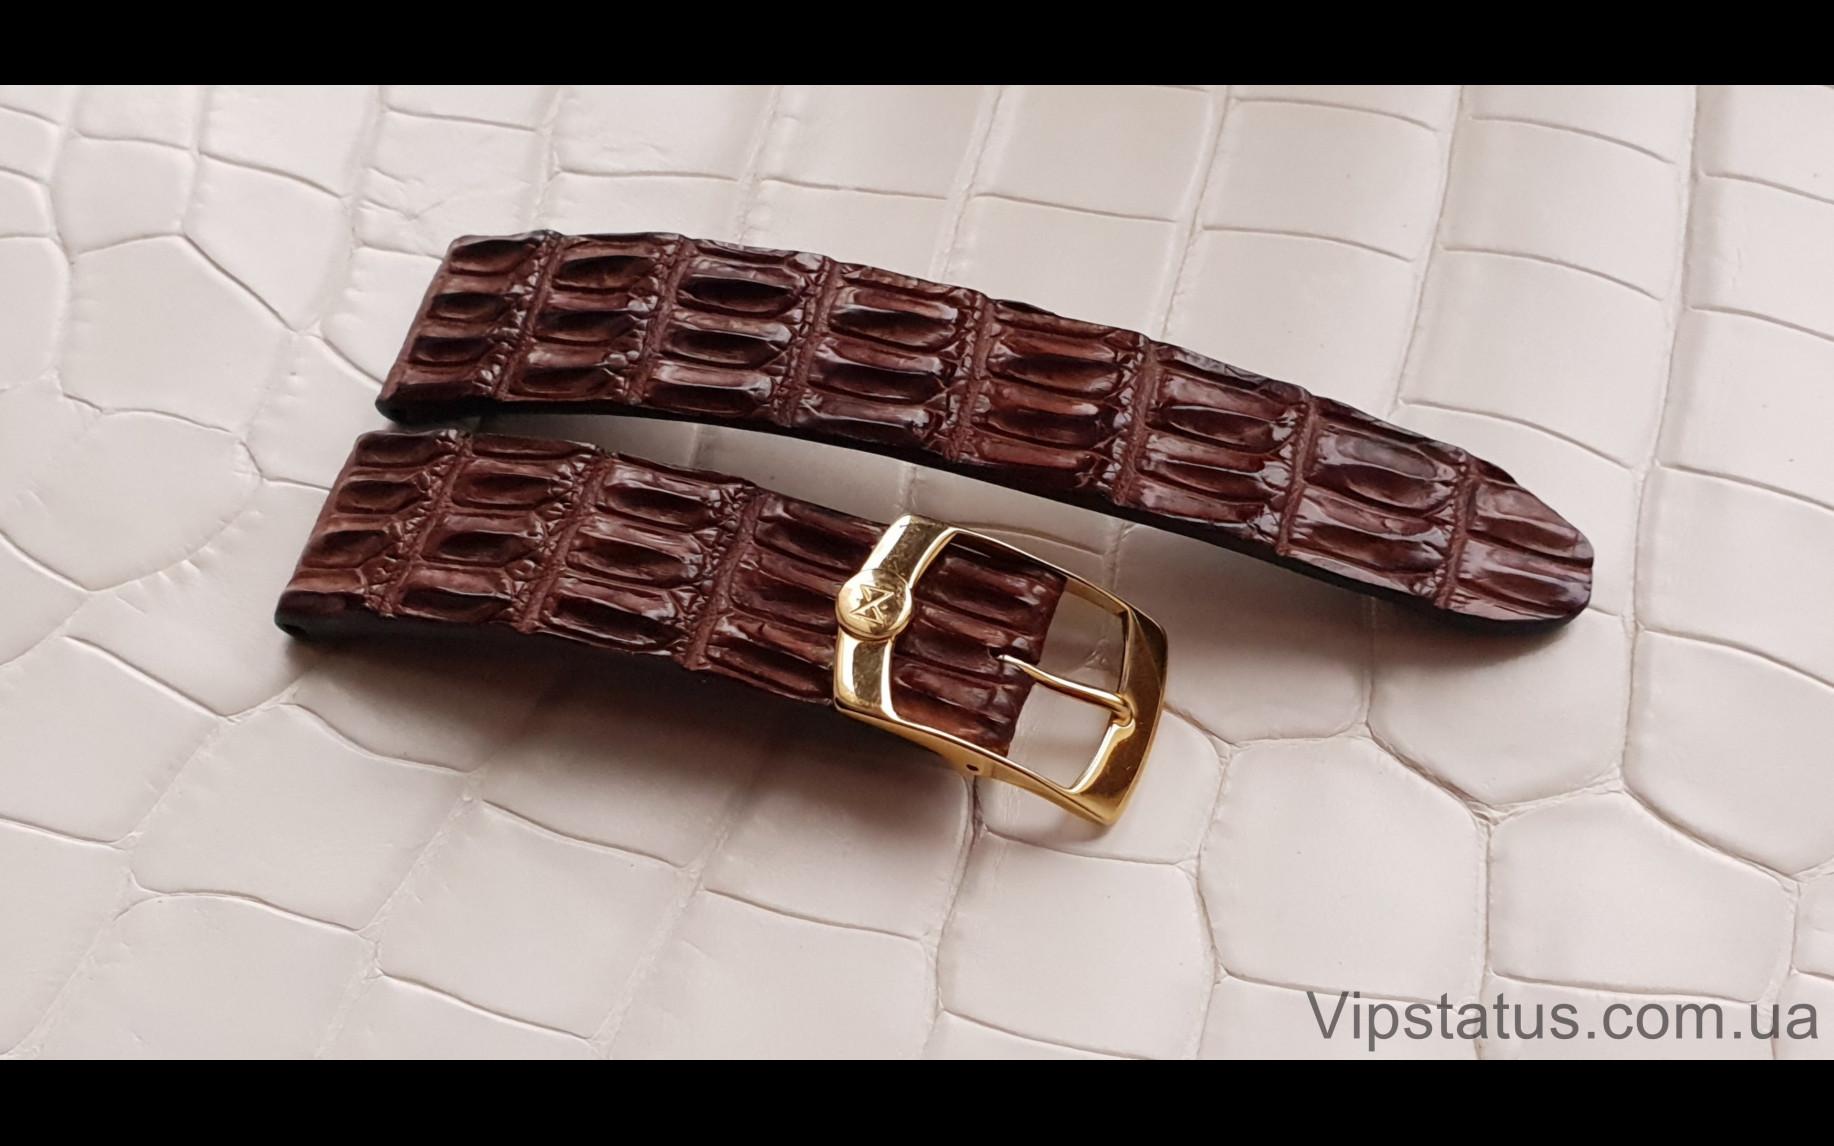 Elite Вип ремешок для часов Chopard кожа крокодила Vip Crocodile Strap for Chopard watches image 4